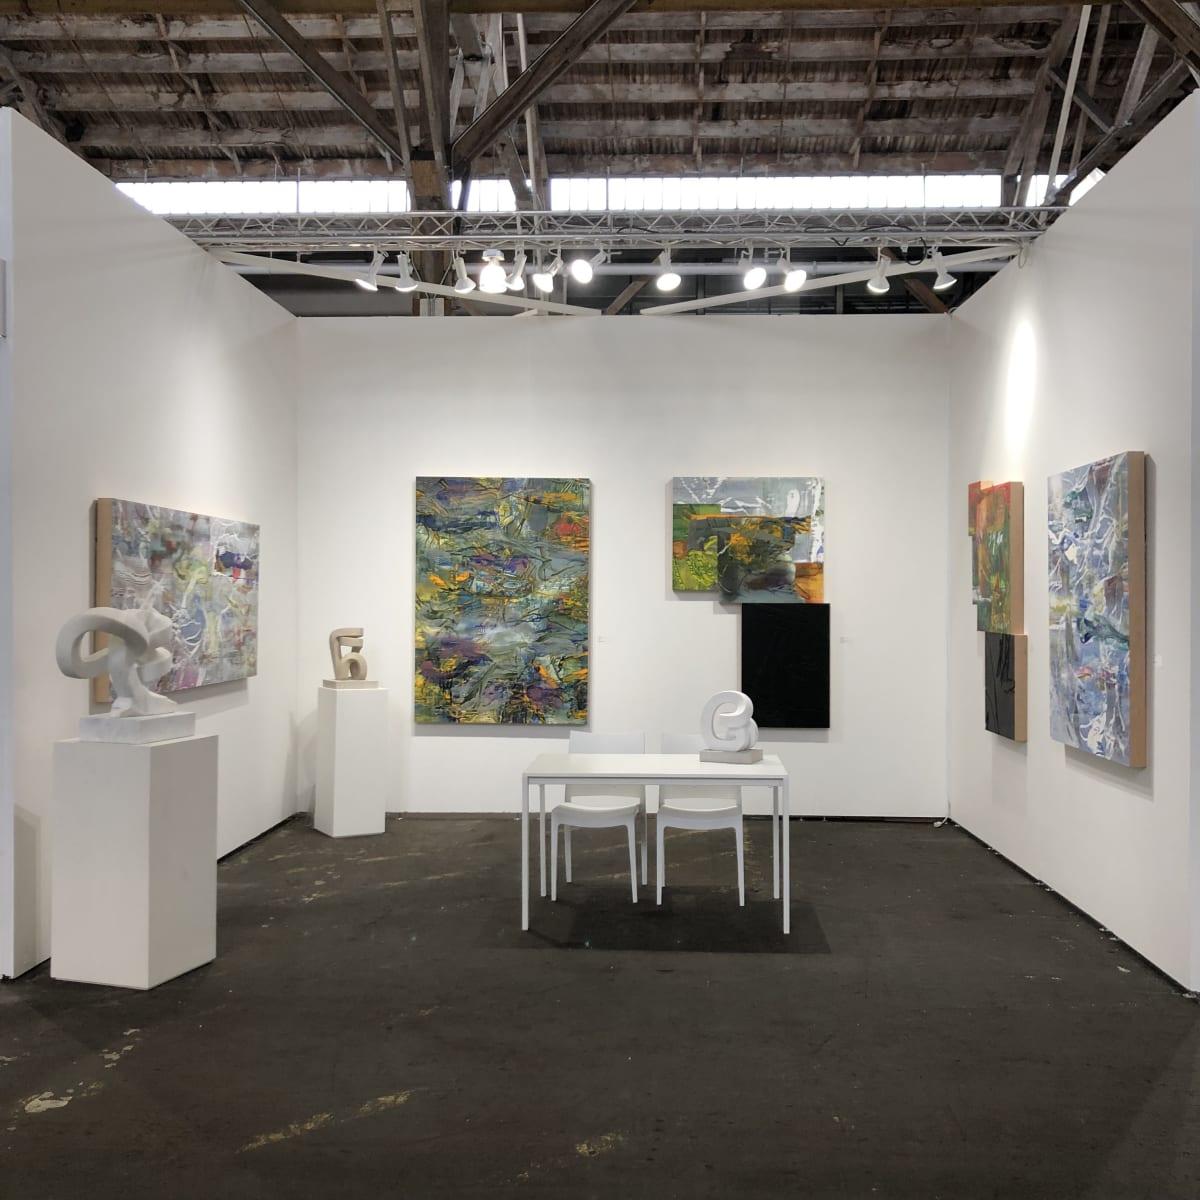 UNTITLED ART, San Francisco: Booth B16